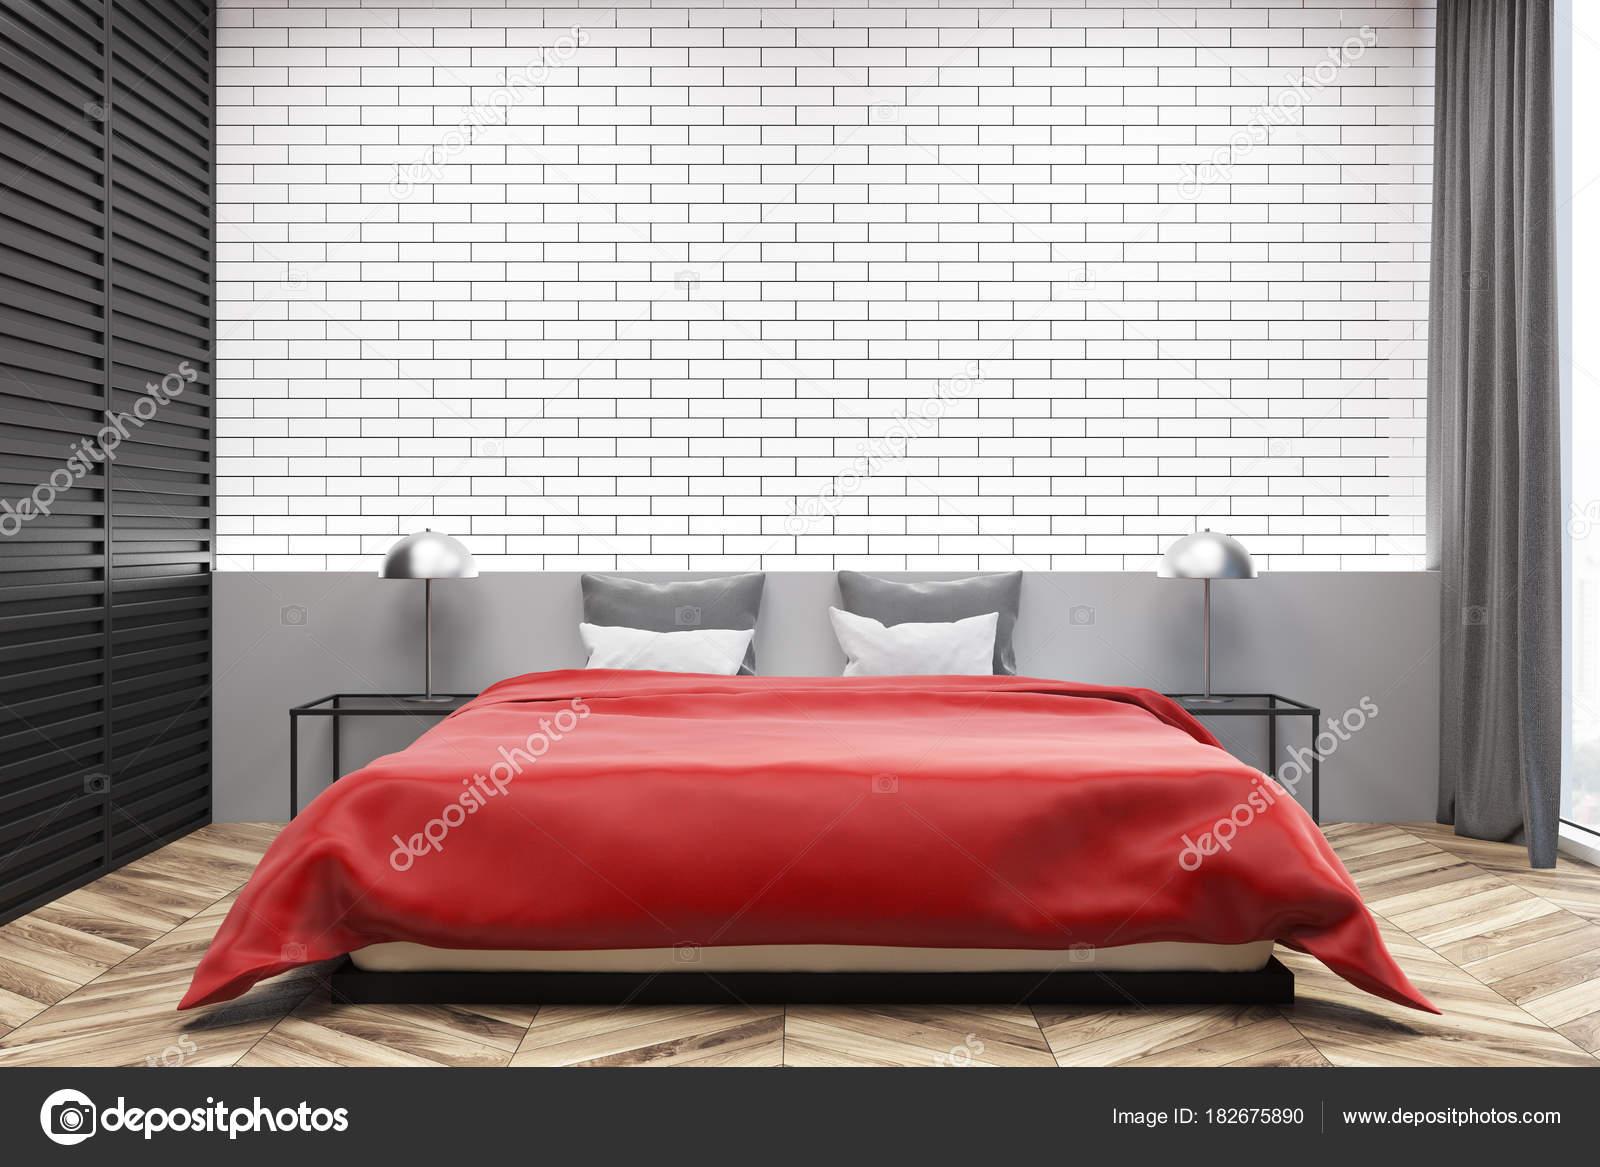 Bordeaux Rode Slaapkamer : Slaapkamer bordeaux. finest slaapkamer ideeen bordeaux slaapkamer